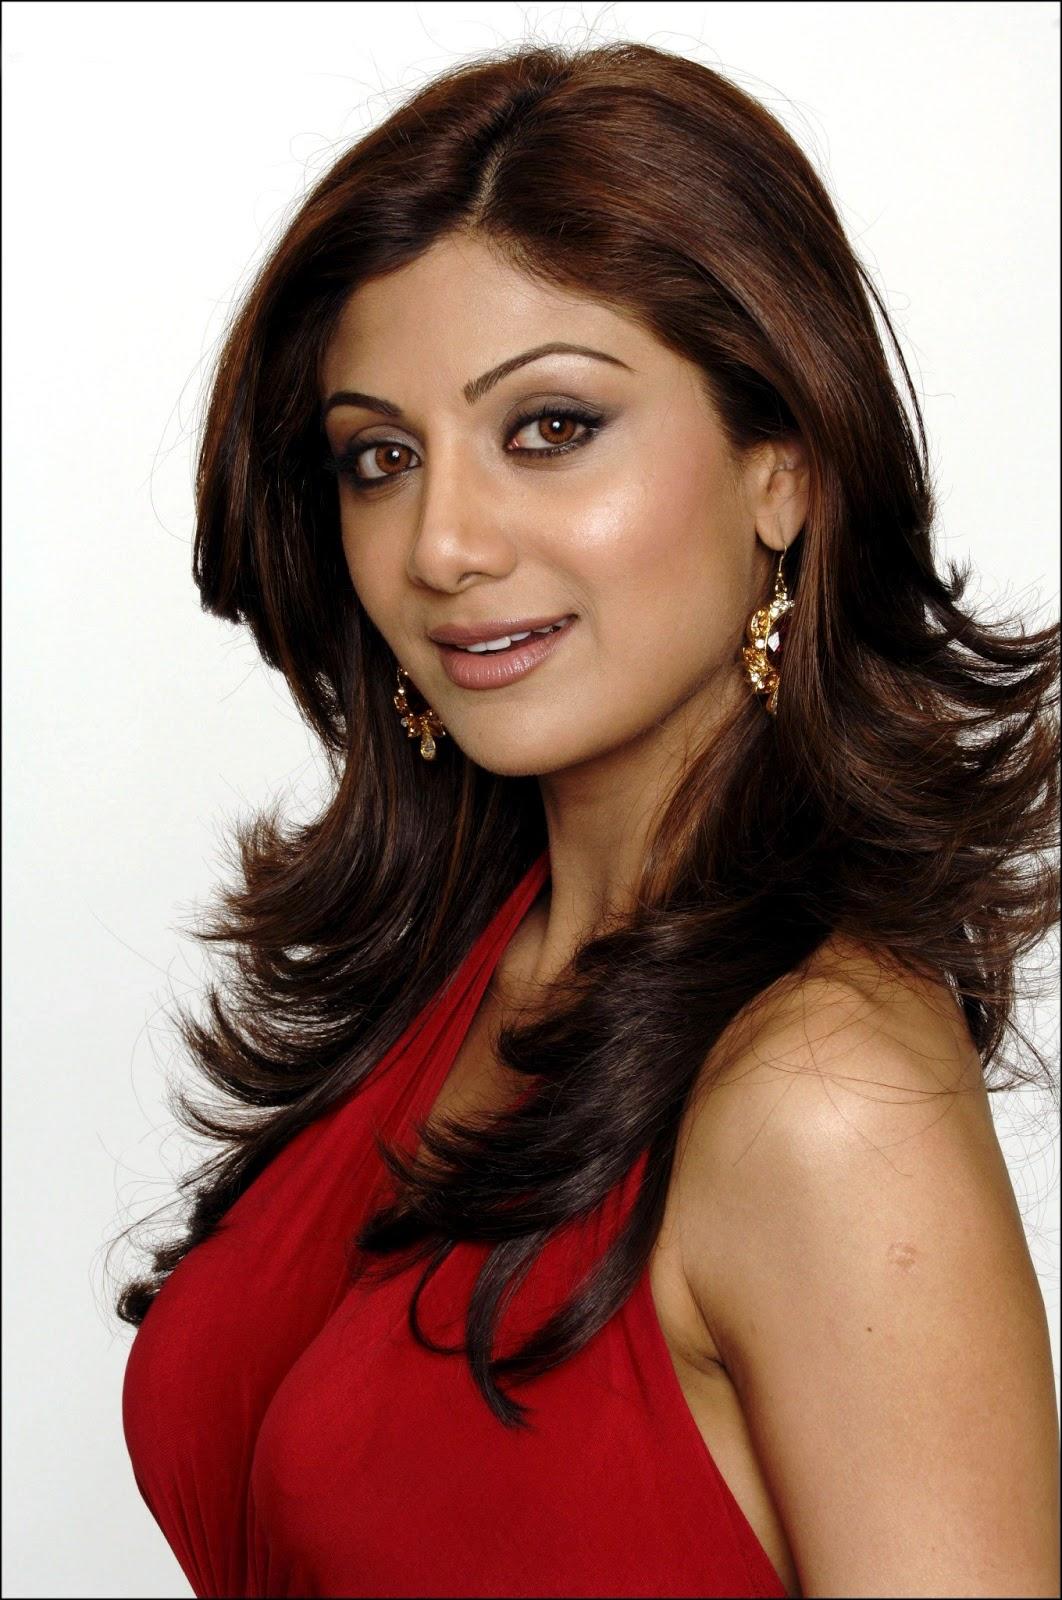 Shilpa Shetty Wedding And Shilpa Shetty Hot High Resolution Hd Wallpapers Free Download